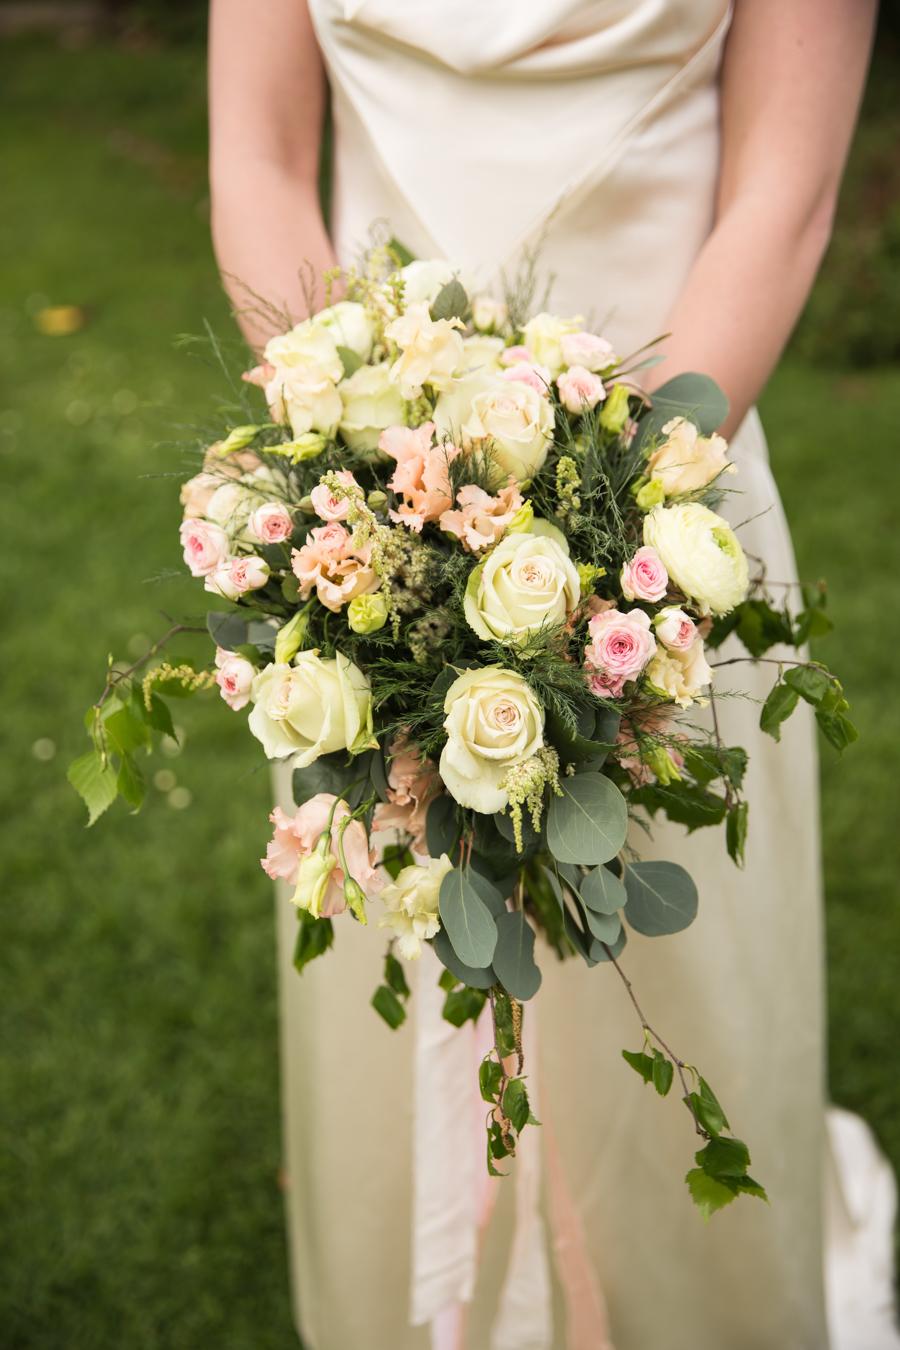 English country garden wedding style ideas with Hannah Larkin Photography (28)